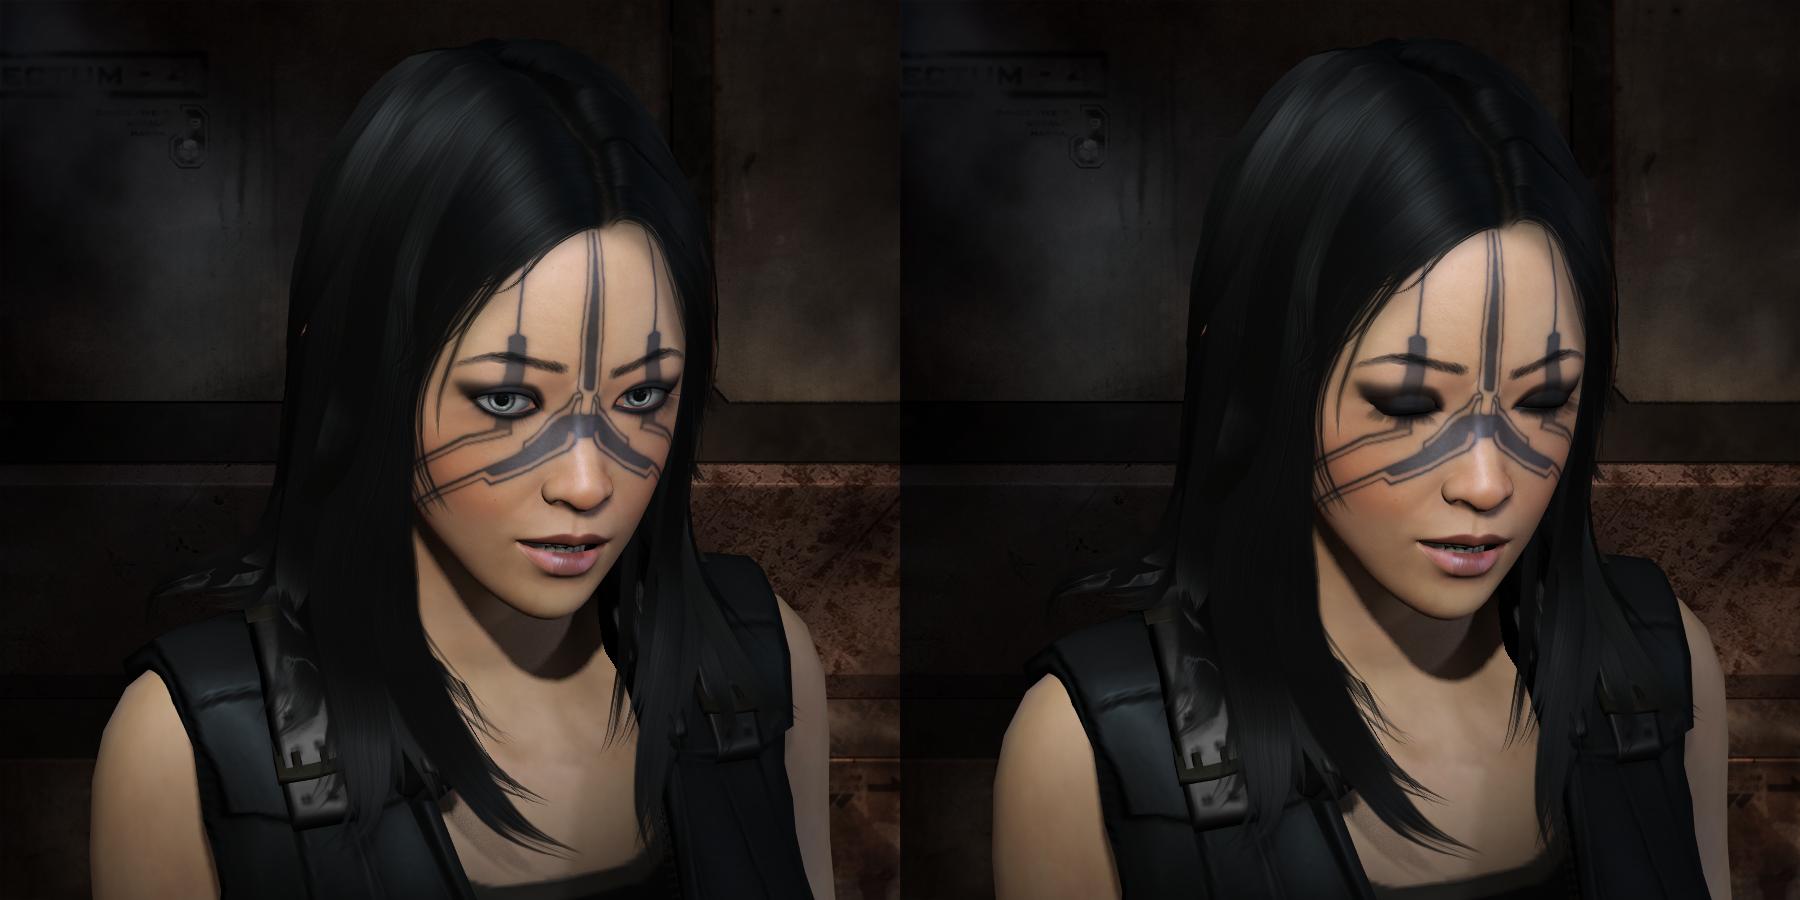 Punky Eve Online Avatar By Djcalus On Deviantart